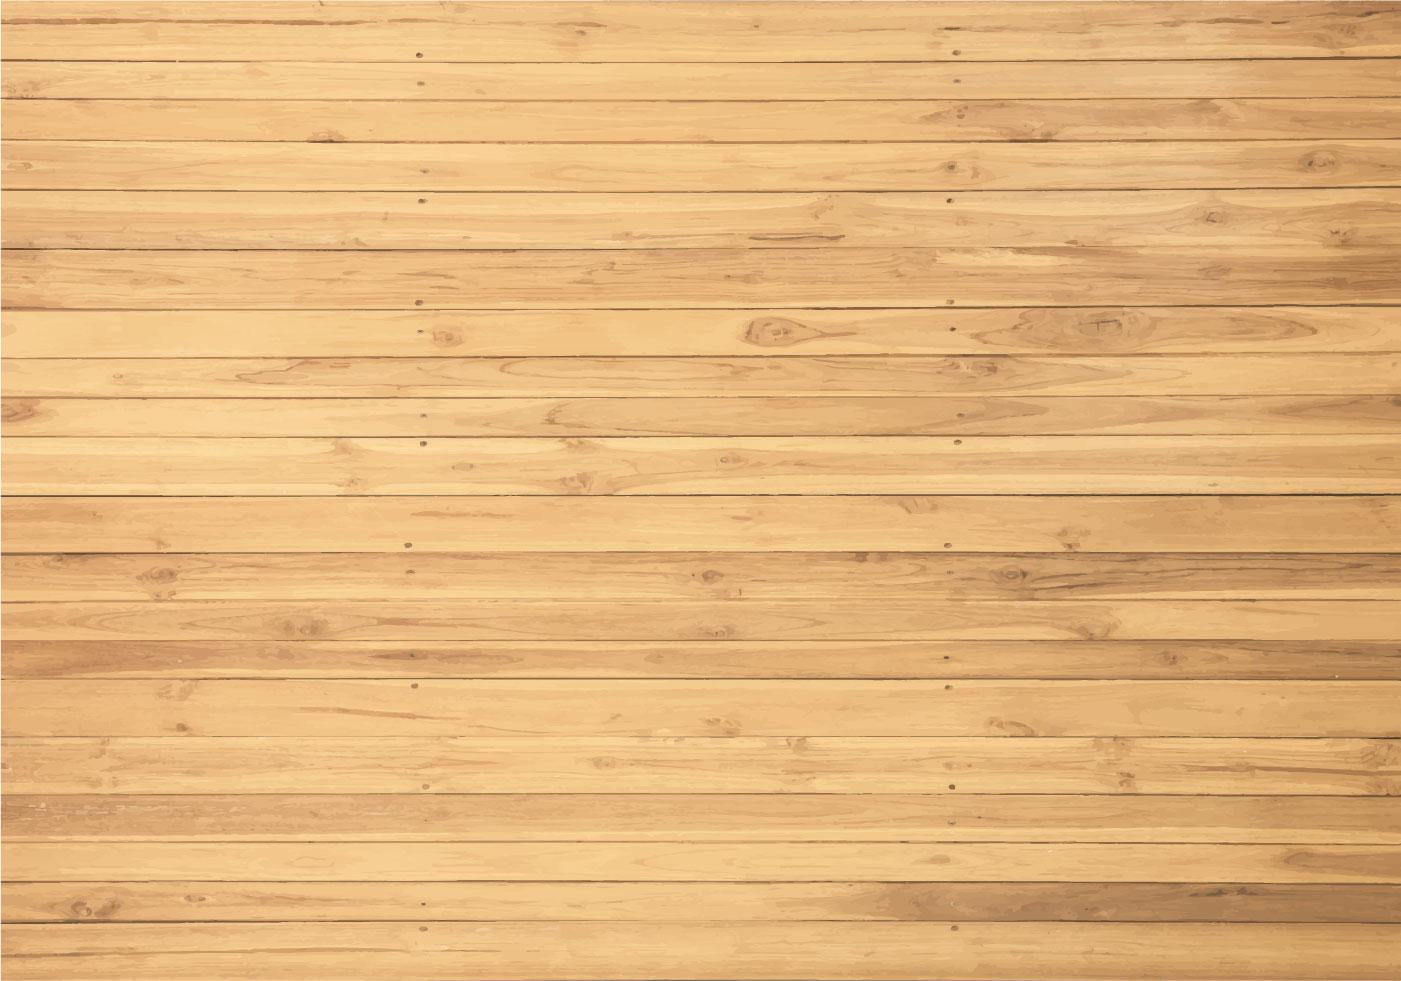 Wood Planks Background Texture   Download Vectors Clipart 1401x981